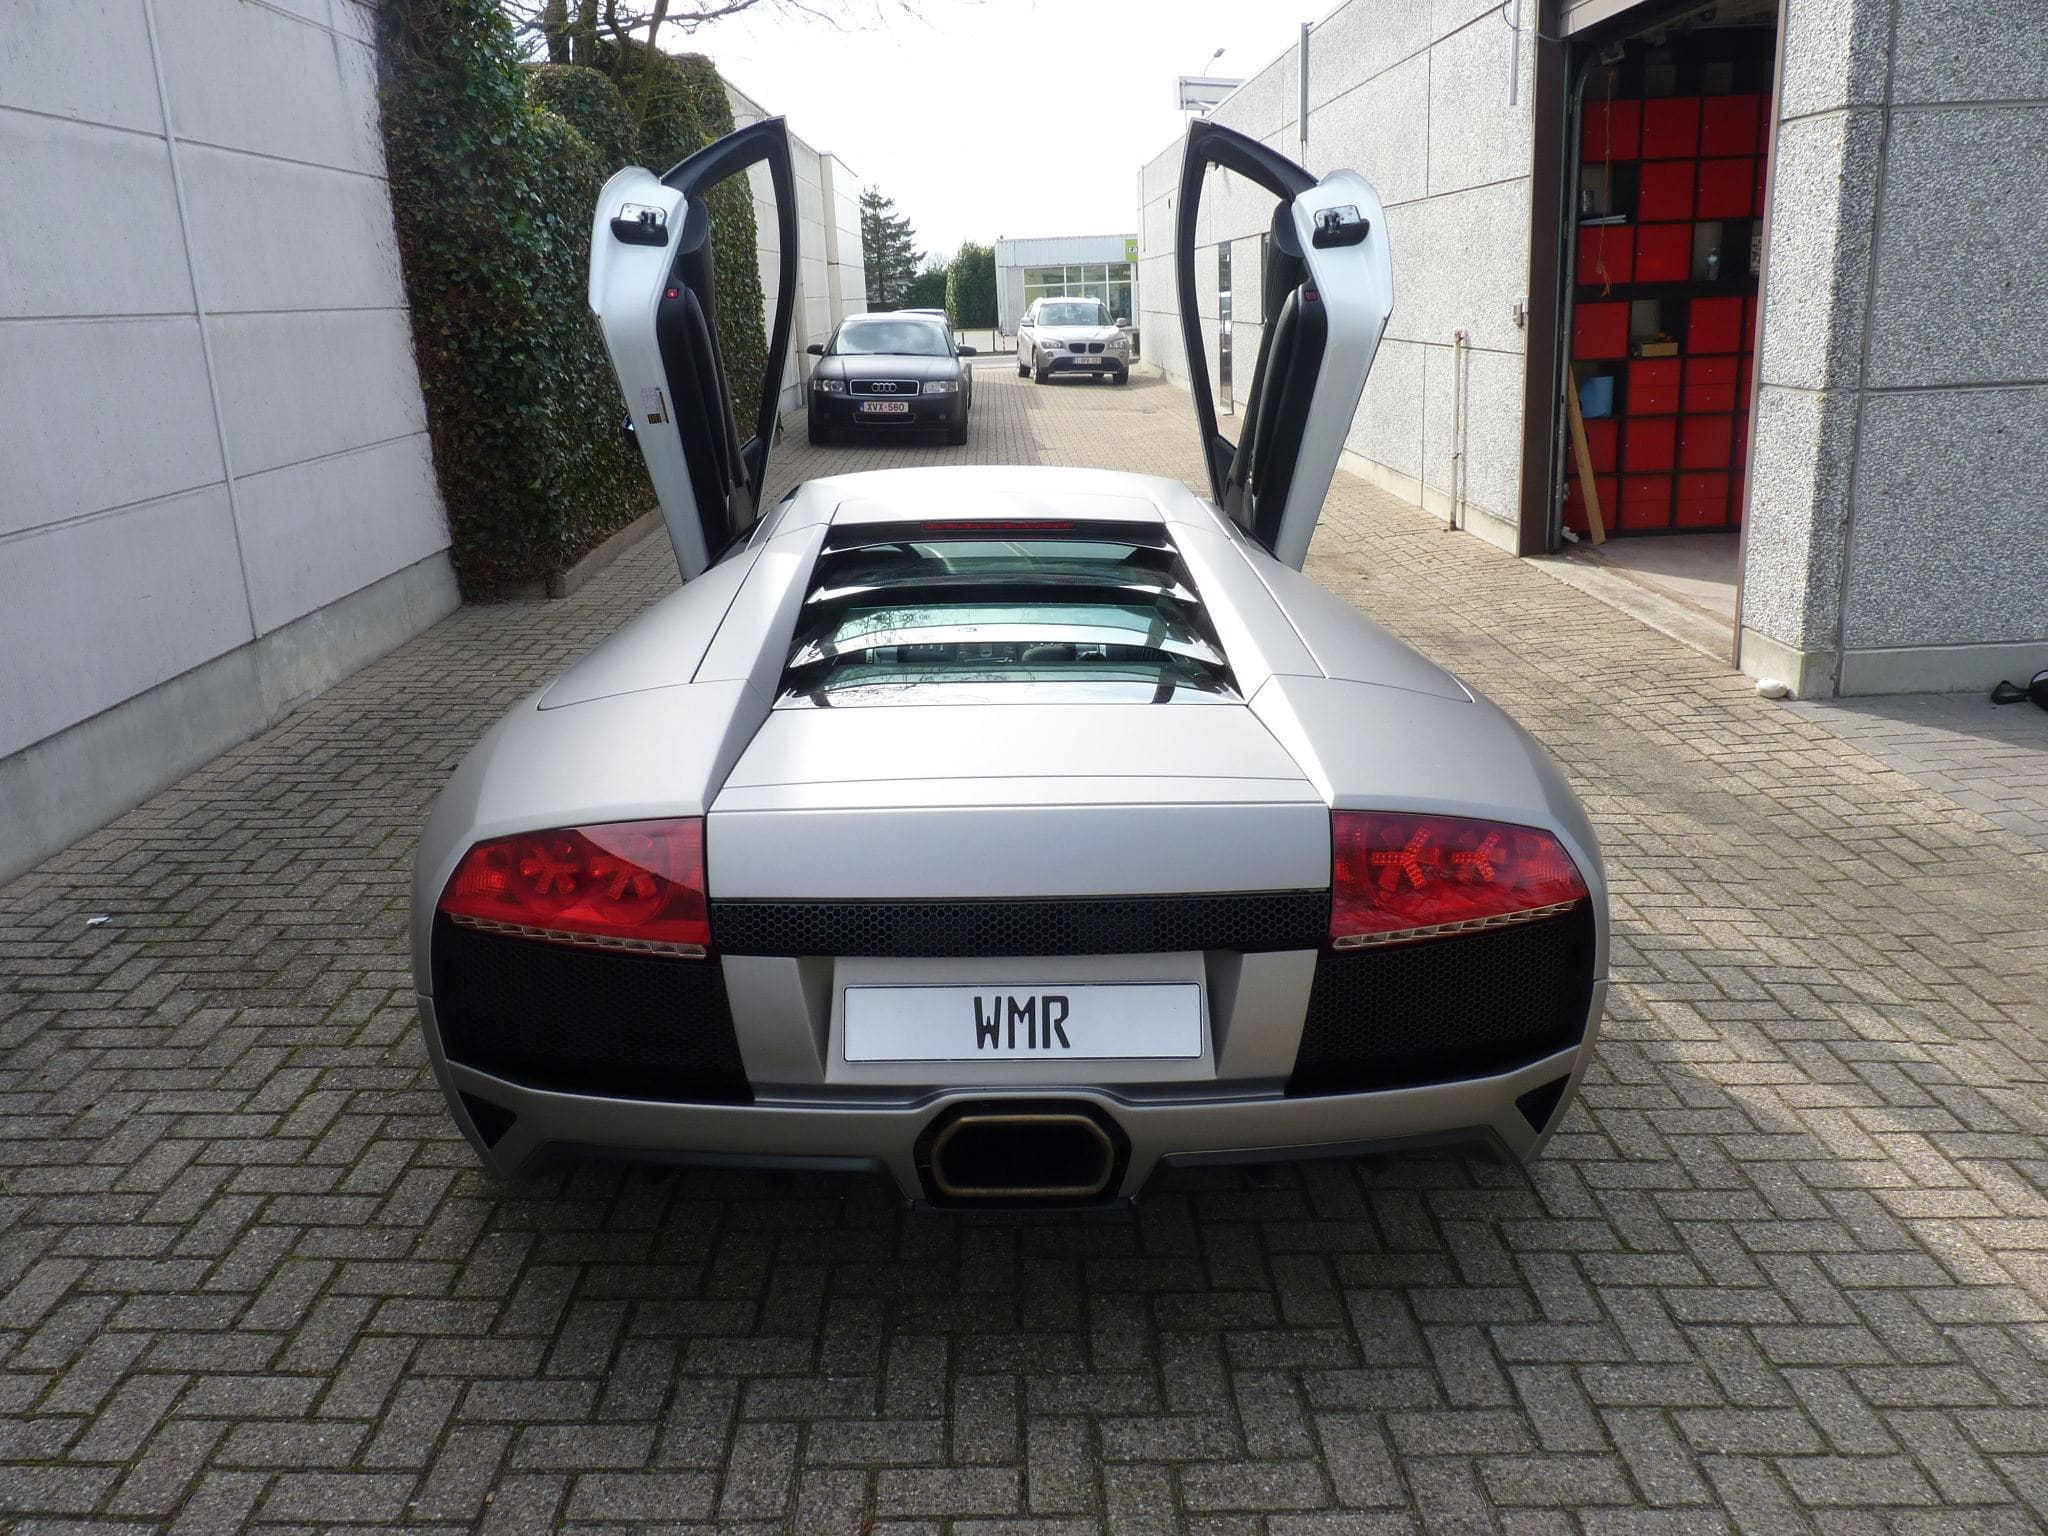 Lamborghini Murcialago LP670 met Gunpowder Wrap, Carwrapping door Wrapmyride.nu Foto-nr:6007, ©2021